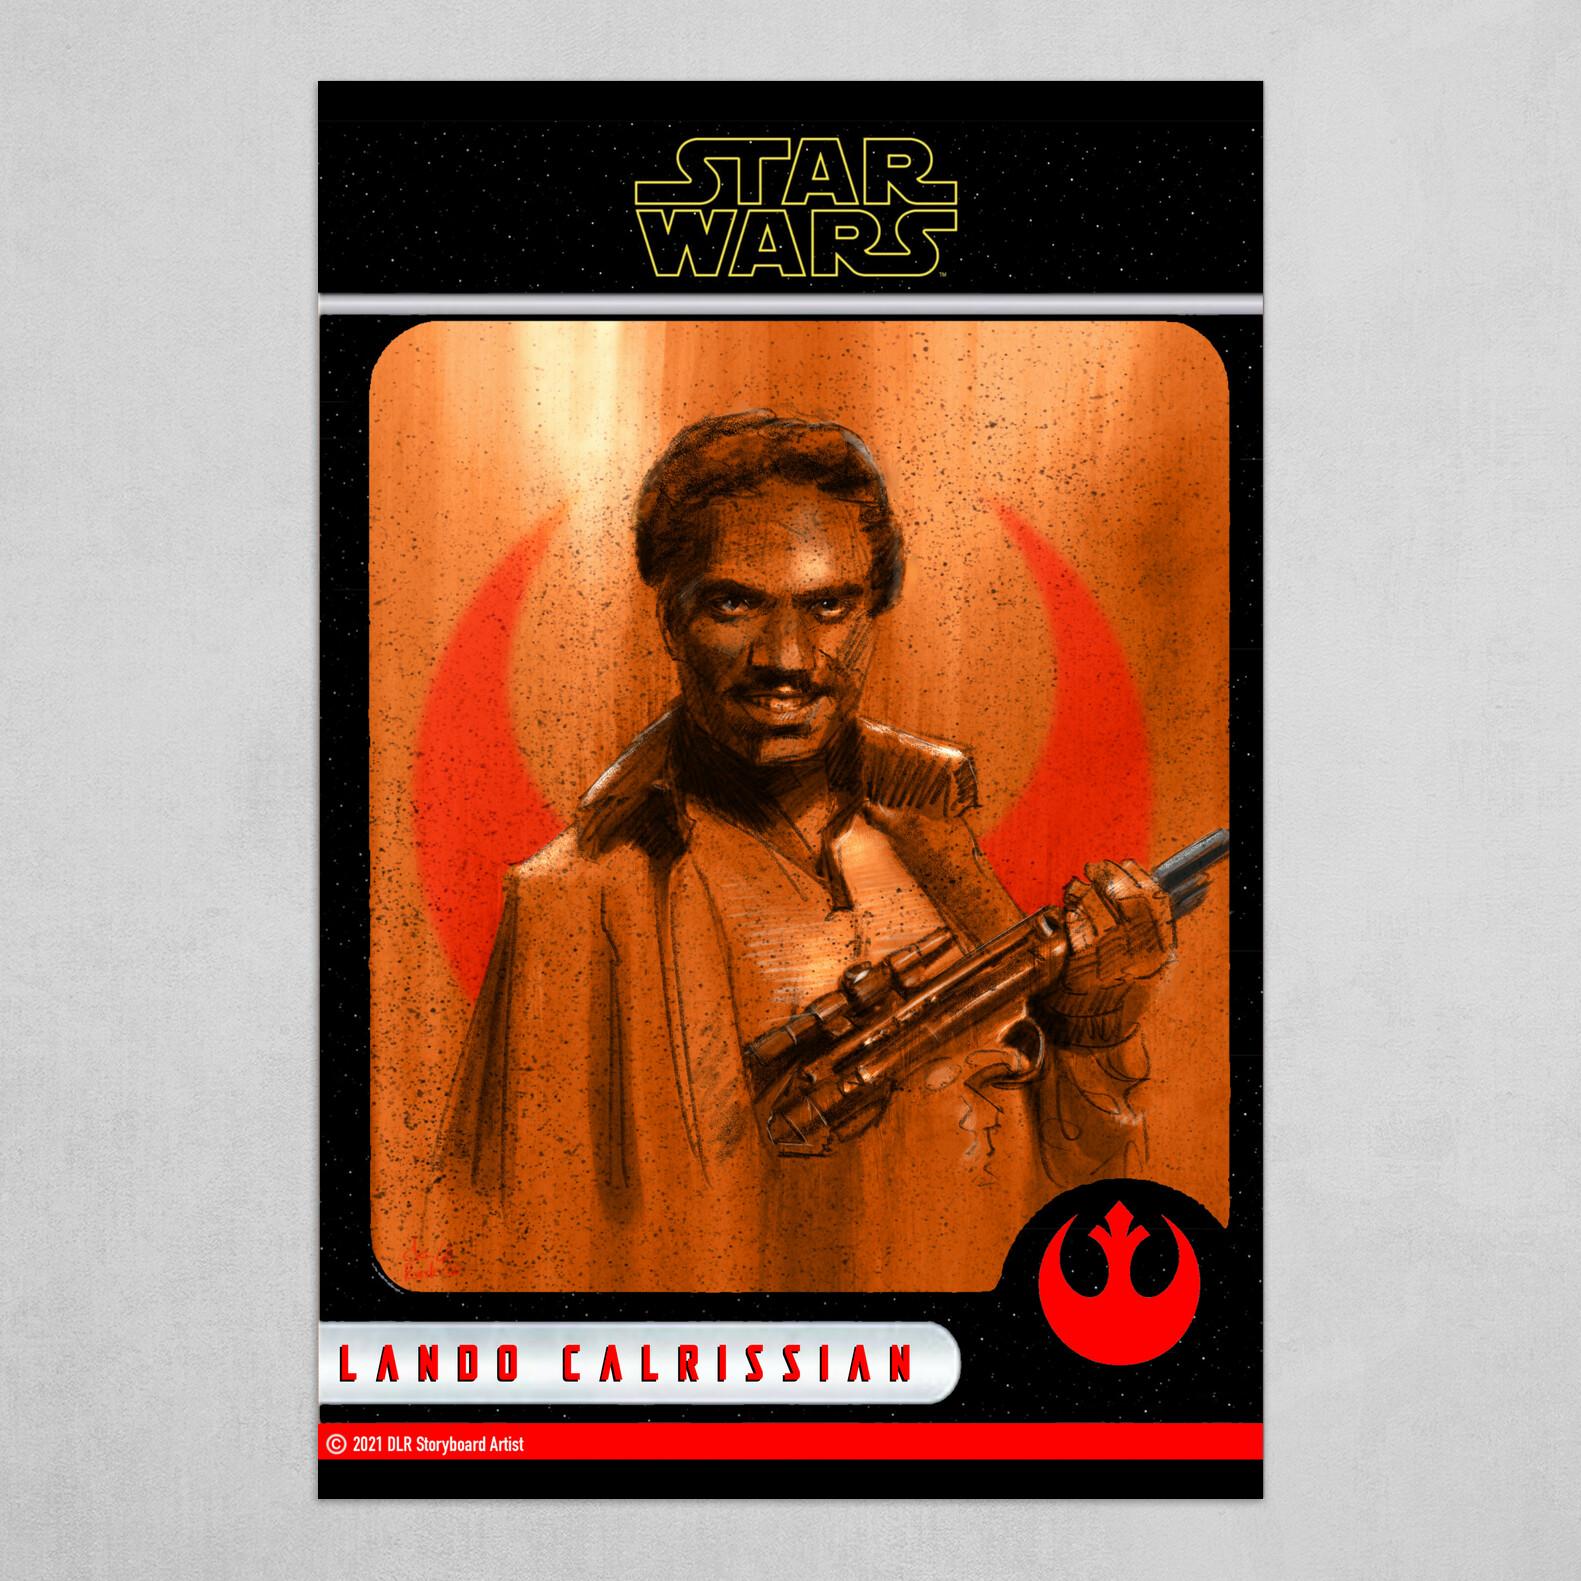 Lando Calrissian Poster (Trading Card Style)